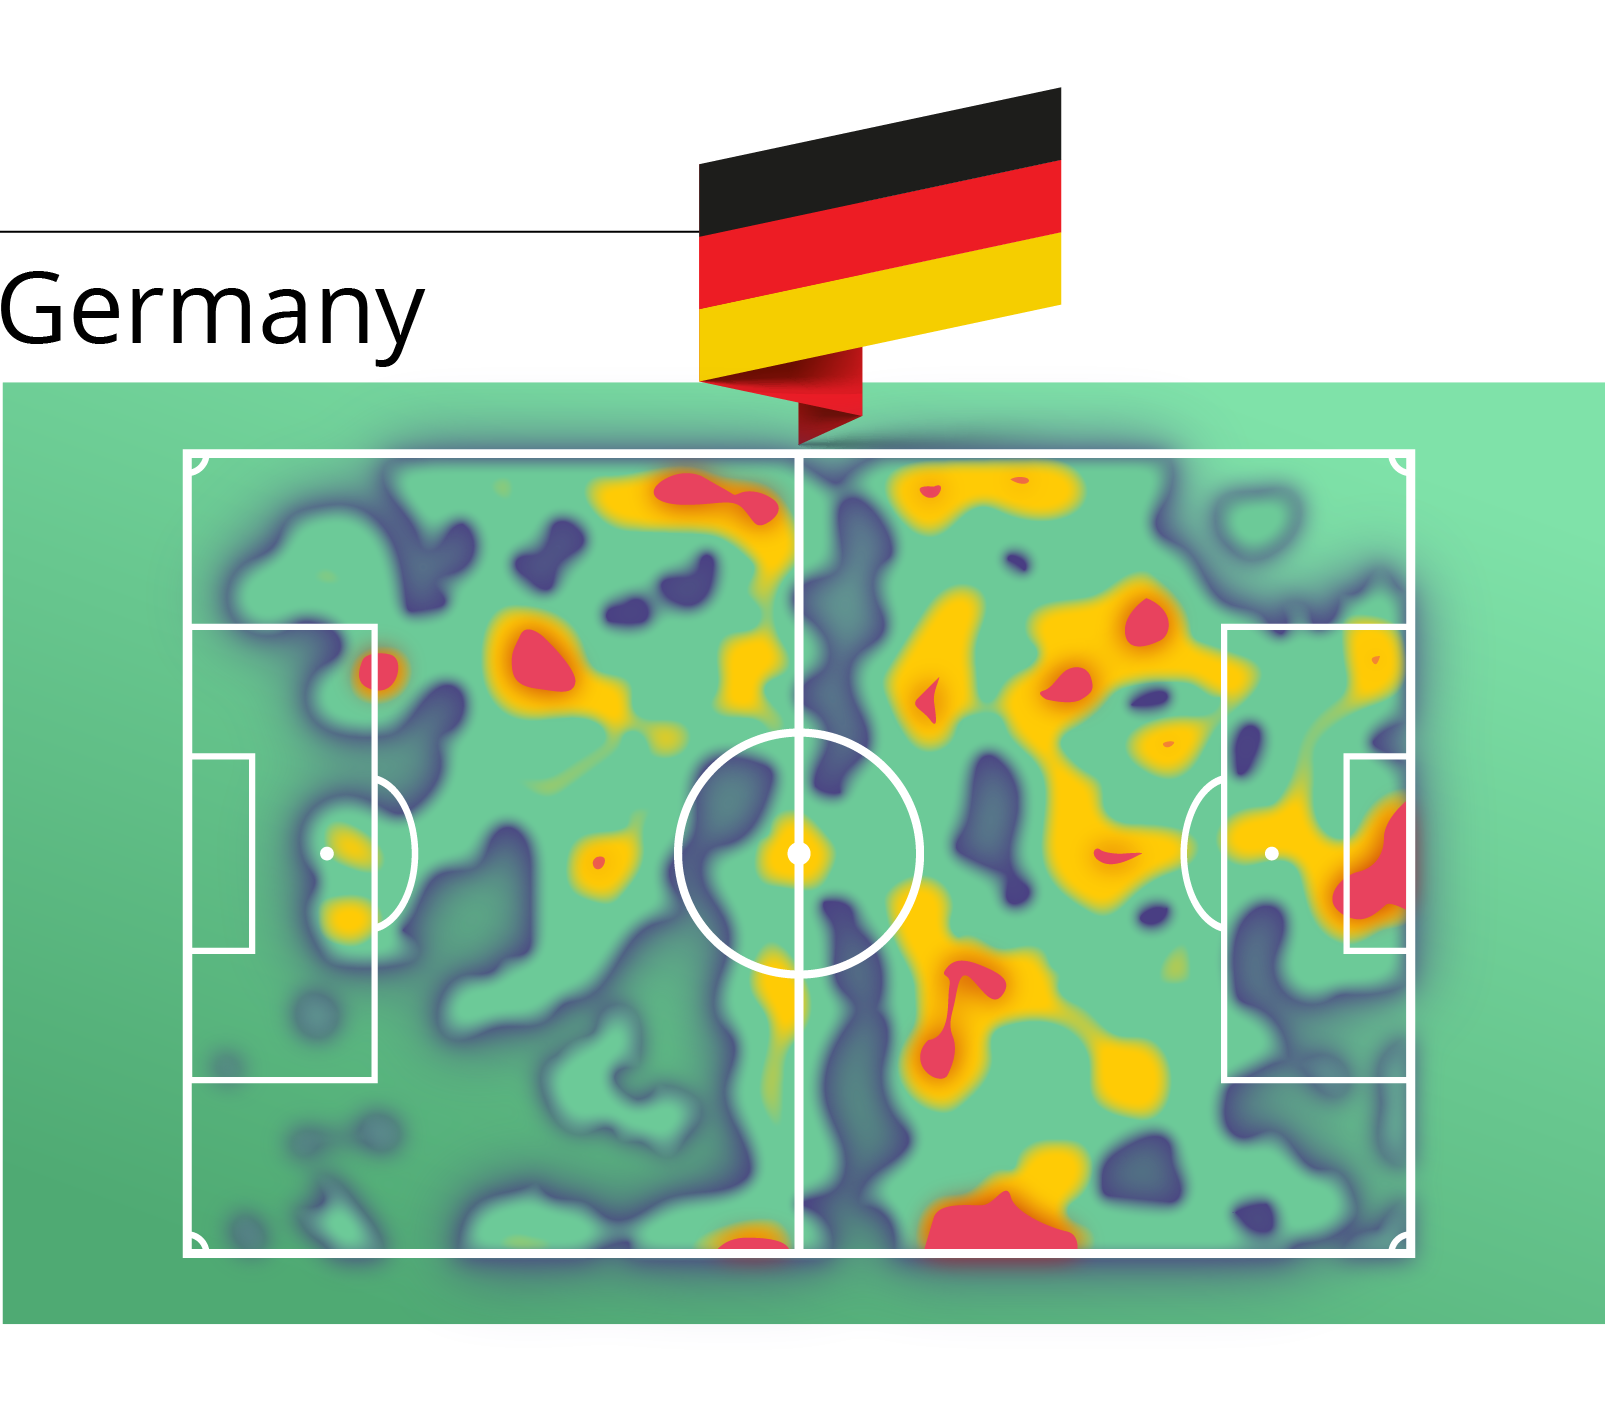 Germany heat map